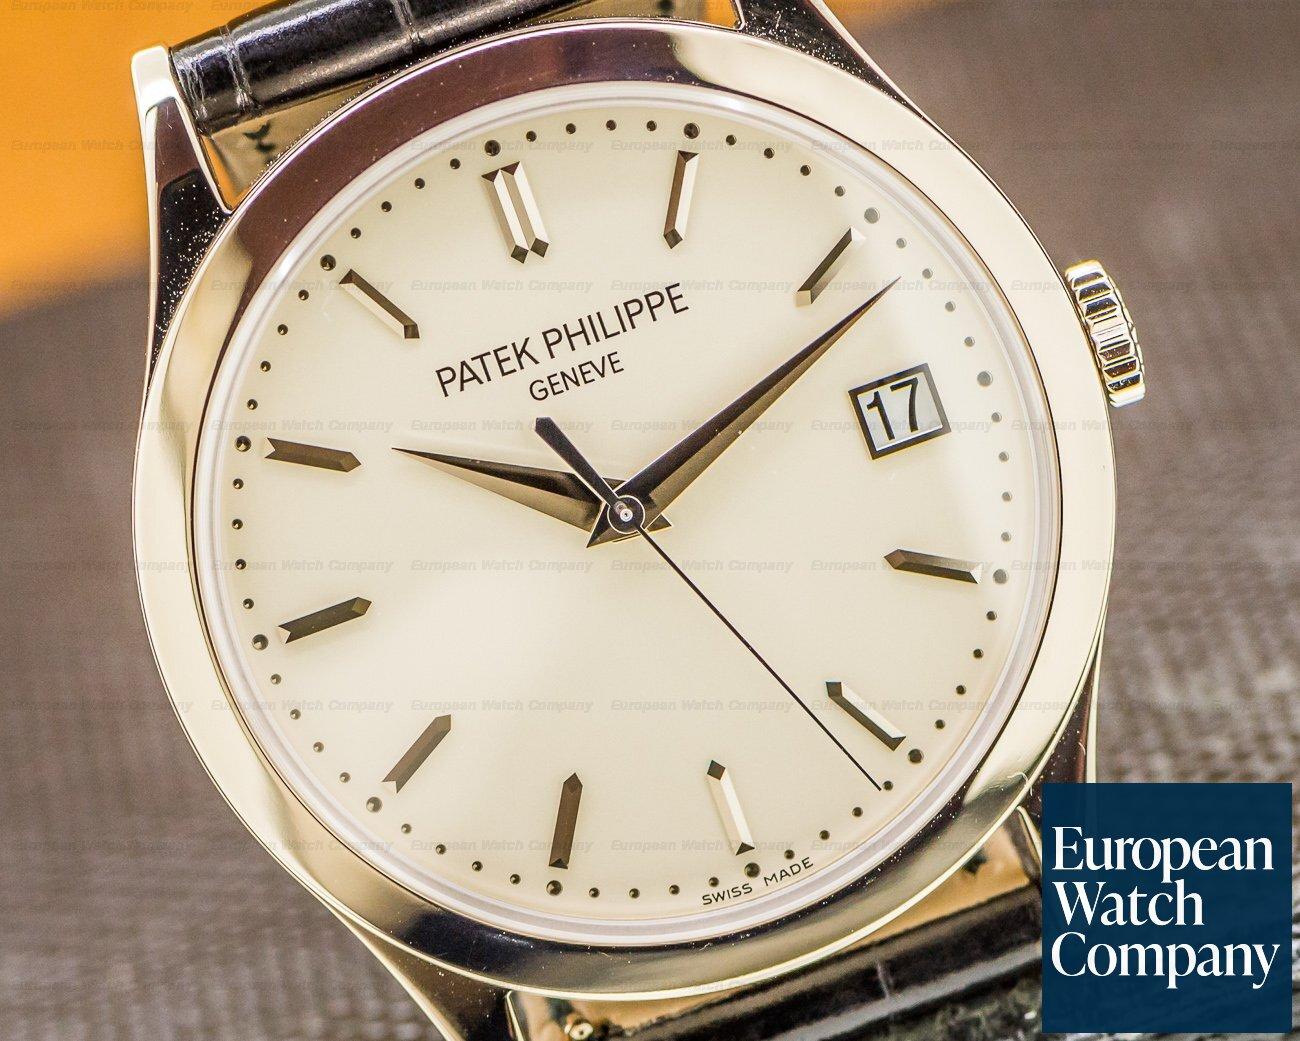 Patek Philippe 5296G-010 Calatrava 18K White Gold Silver Dial UNWORN